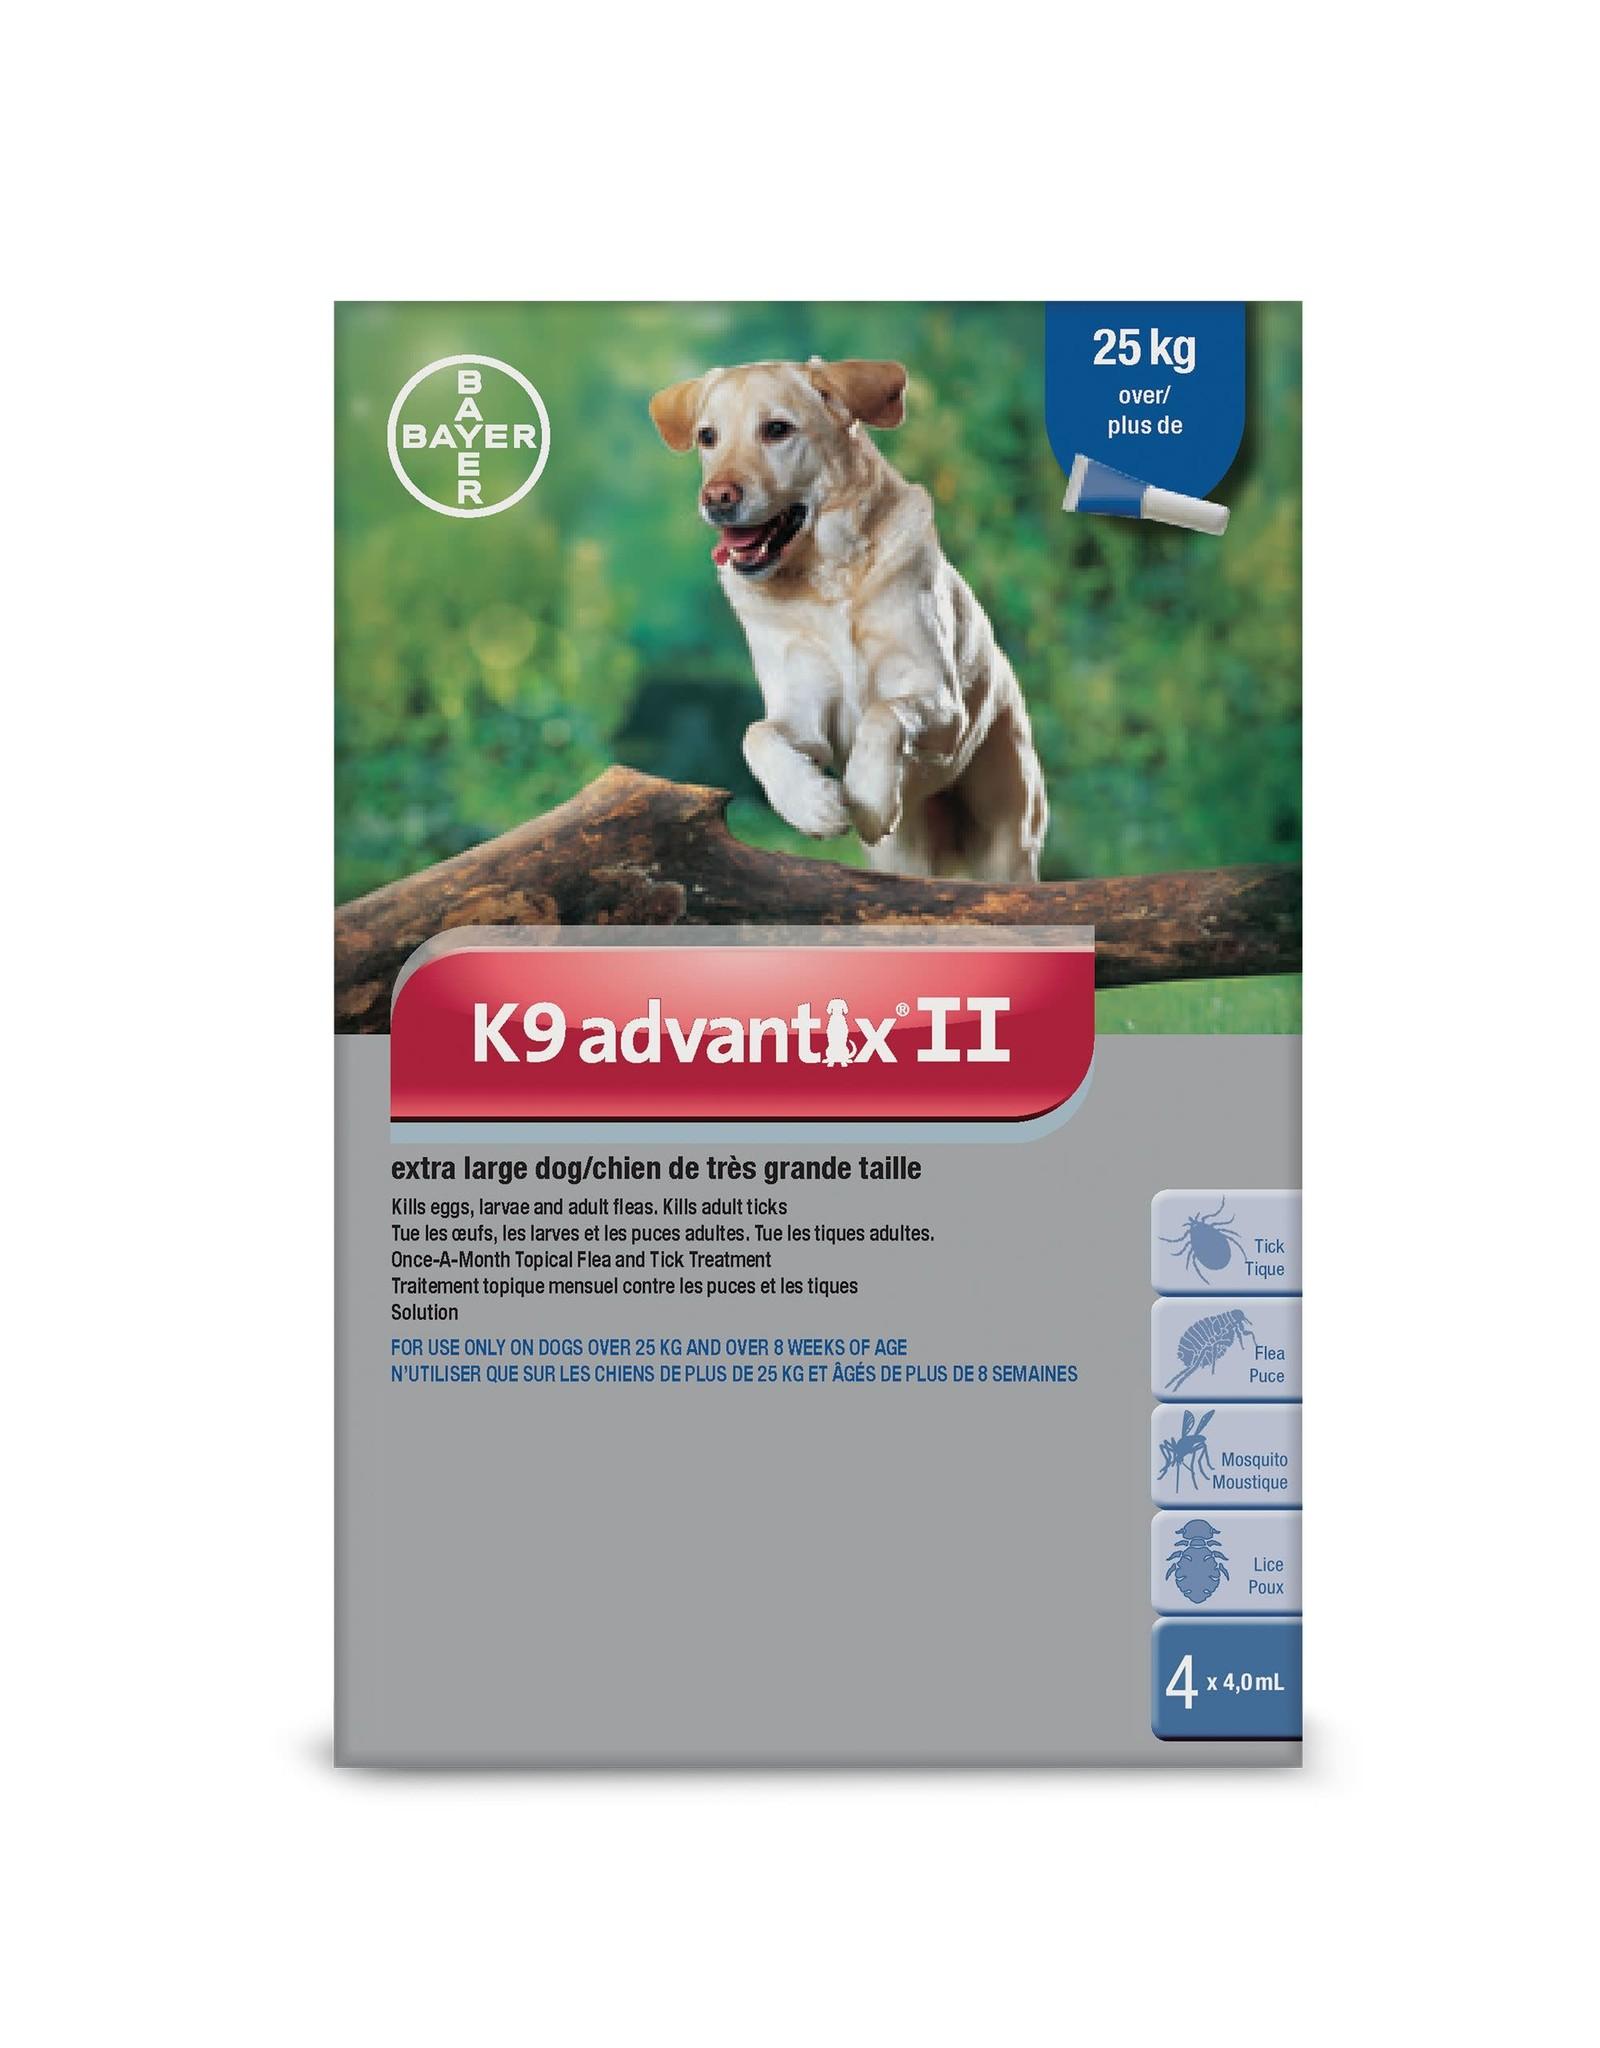 Bayer K9 Advantix II - over 25kg, 4 doses